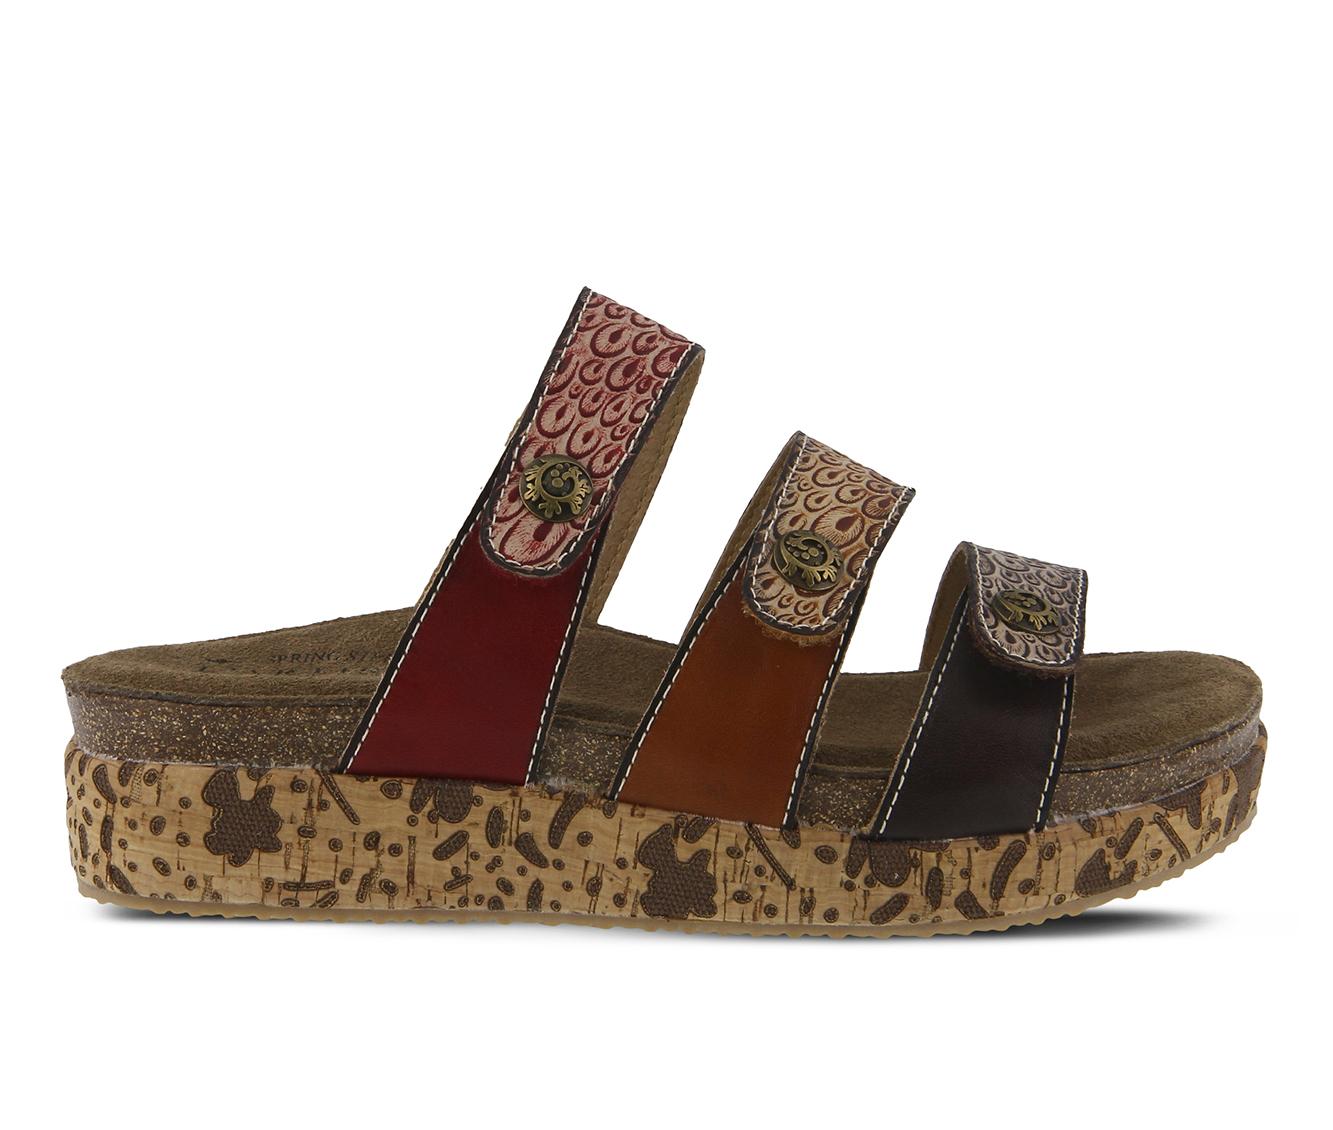 L'Artiste Keena Women's Sandal (Brown Leather)